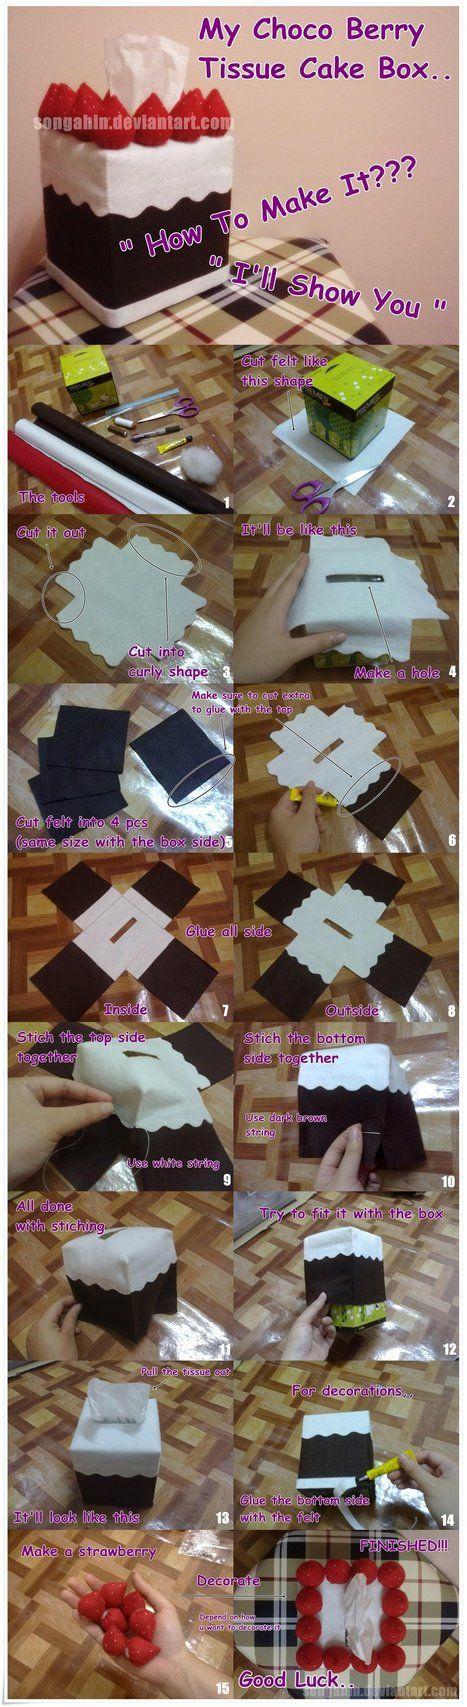 Choco Berry Tissue Bx Tutorial by SongAhIn on deviantART